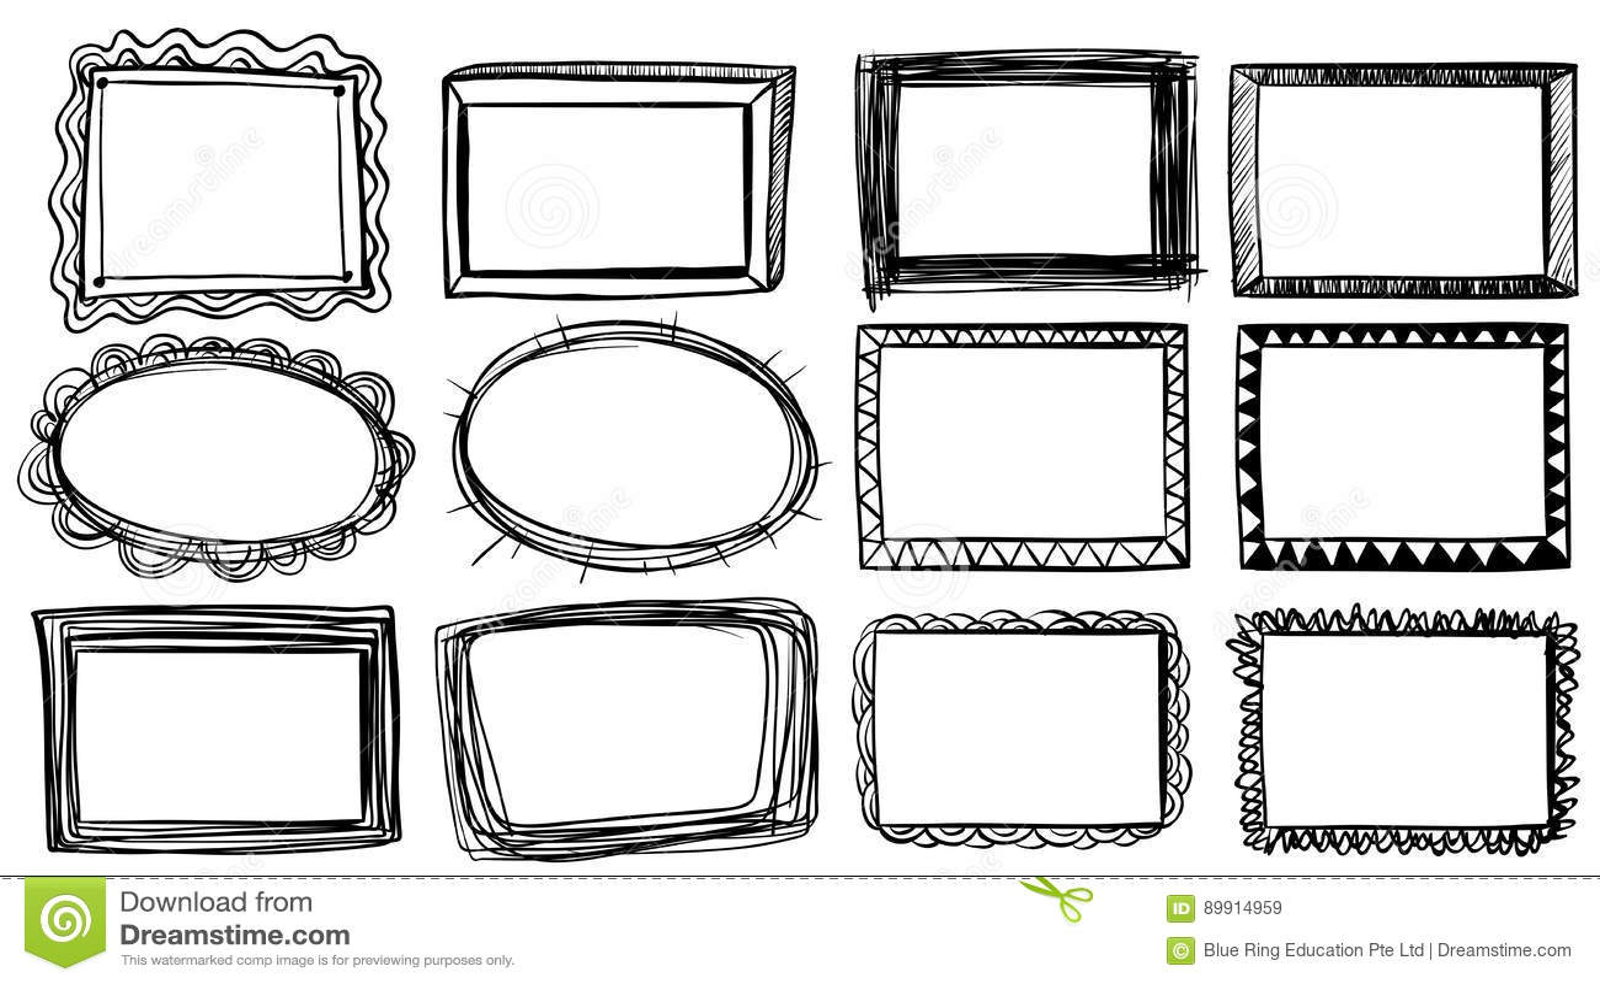 Different Designs For Frames Stock Vector - Illustration of ...